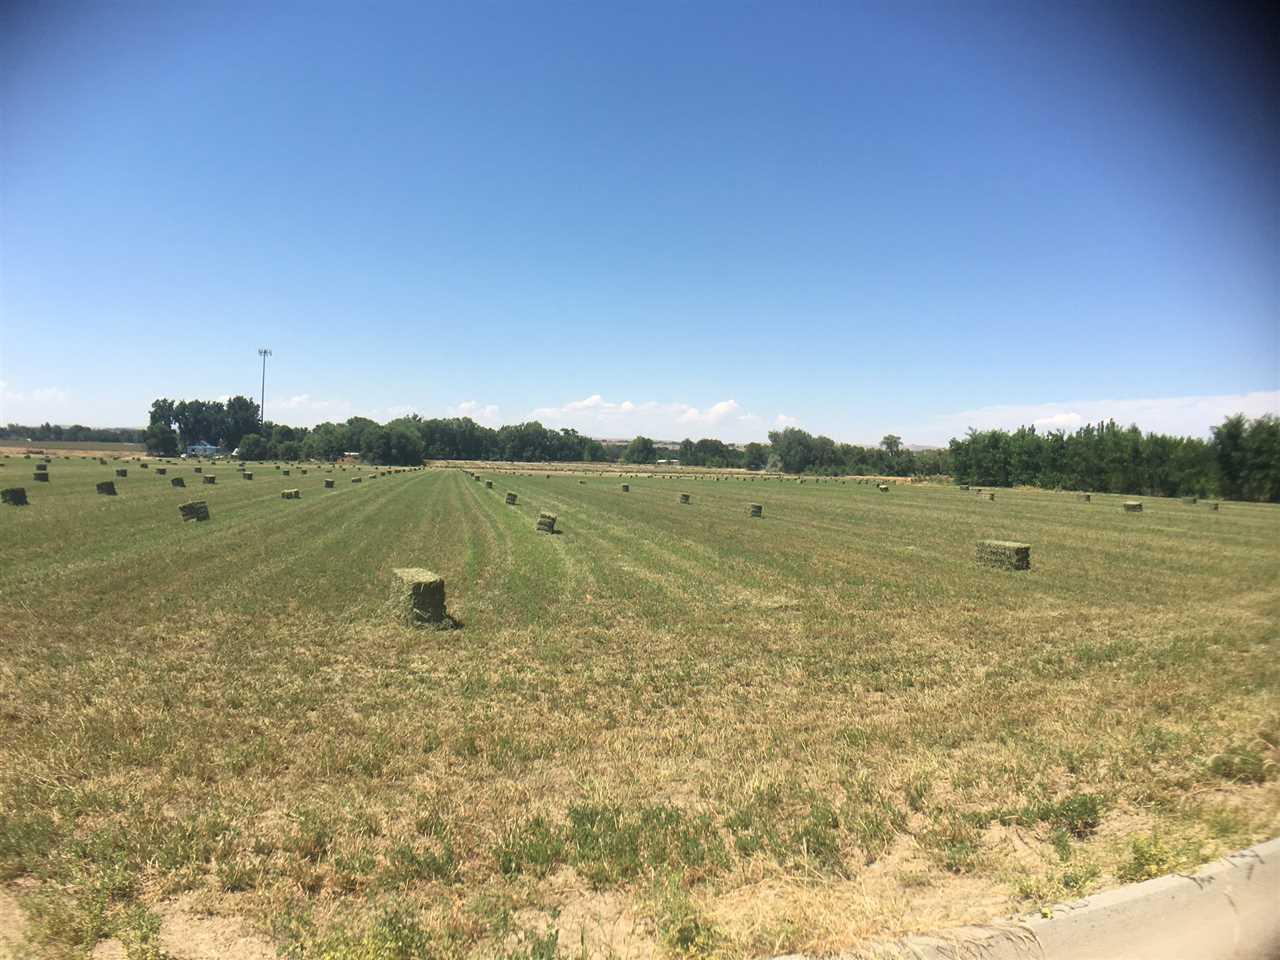 TBD Iowa Ave,Payette,Idaho 83661,Farm & Ranch,TBD Iowa Ave,98670558